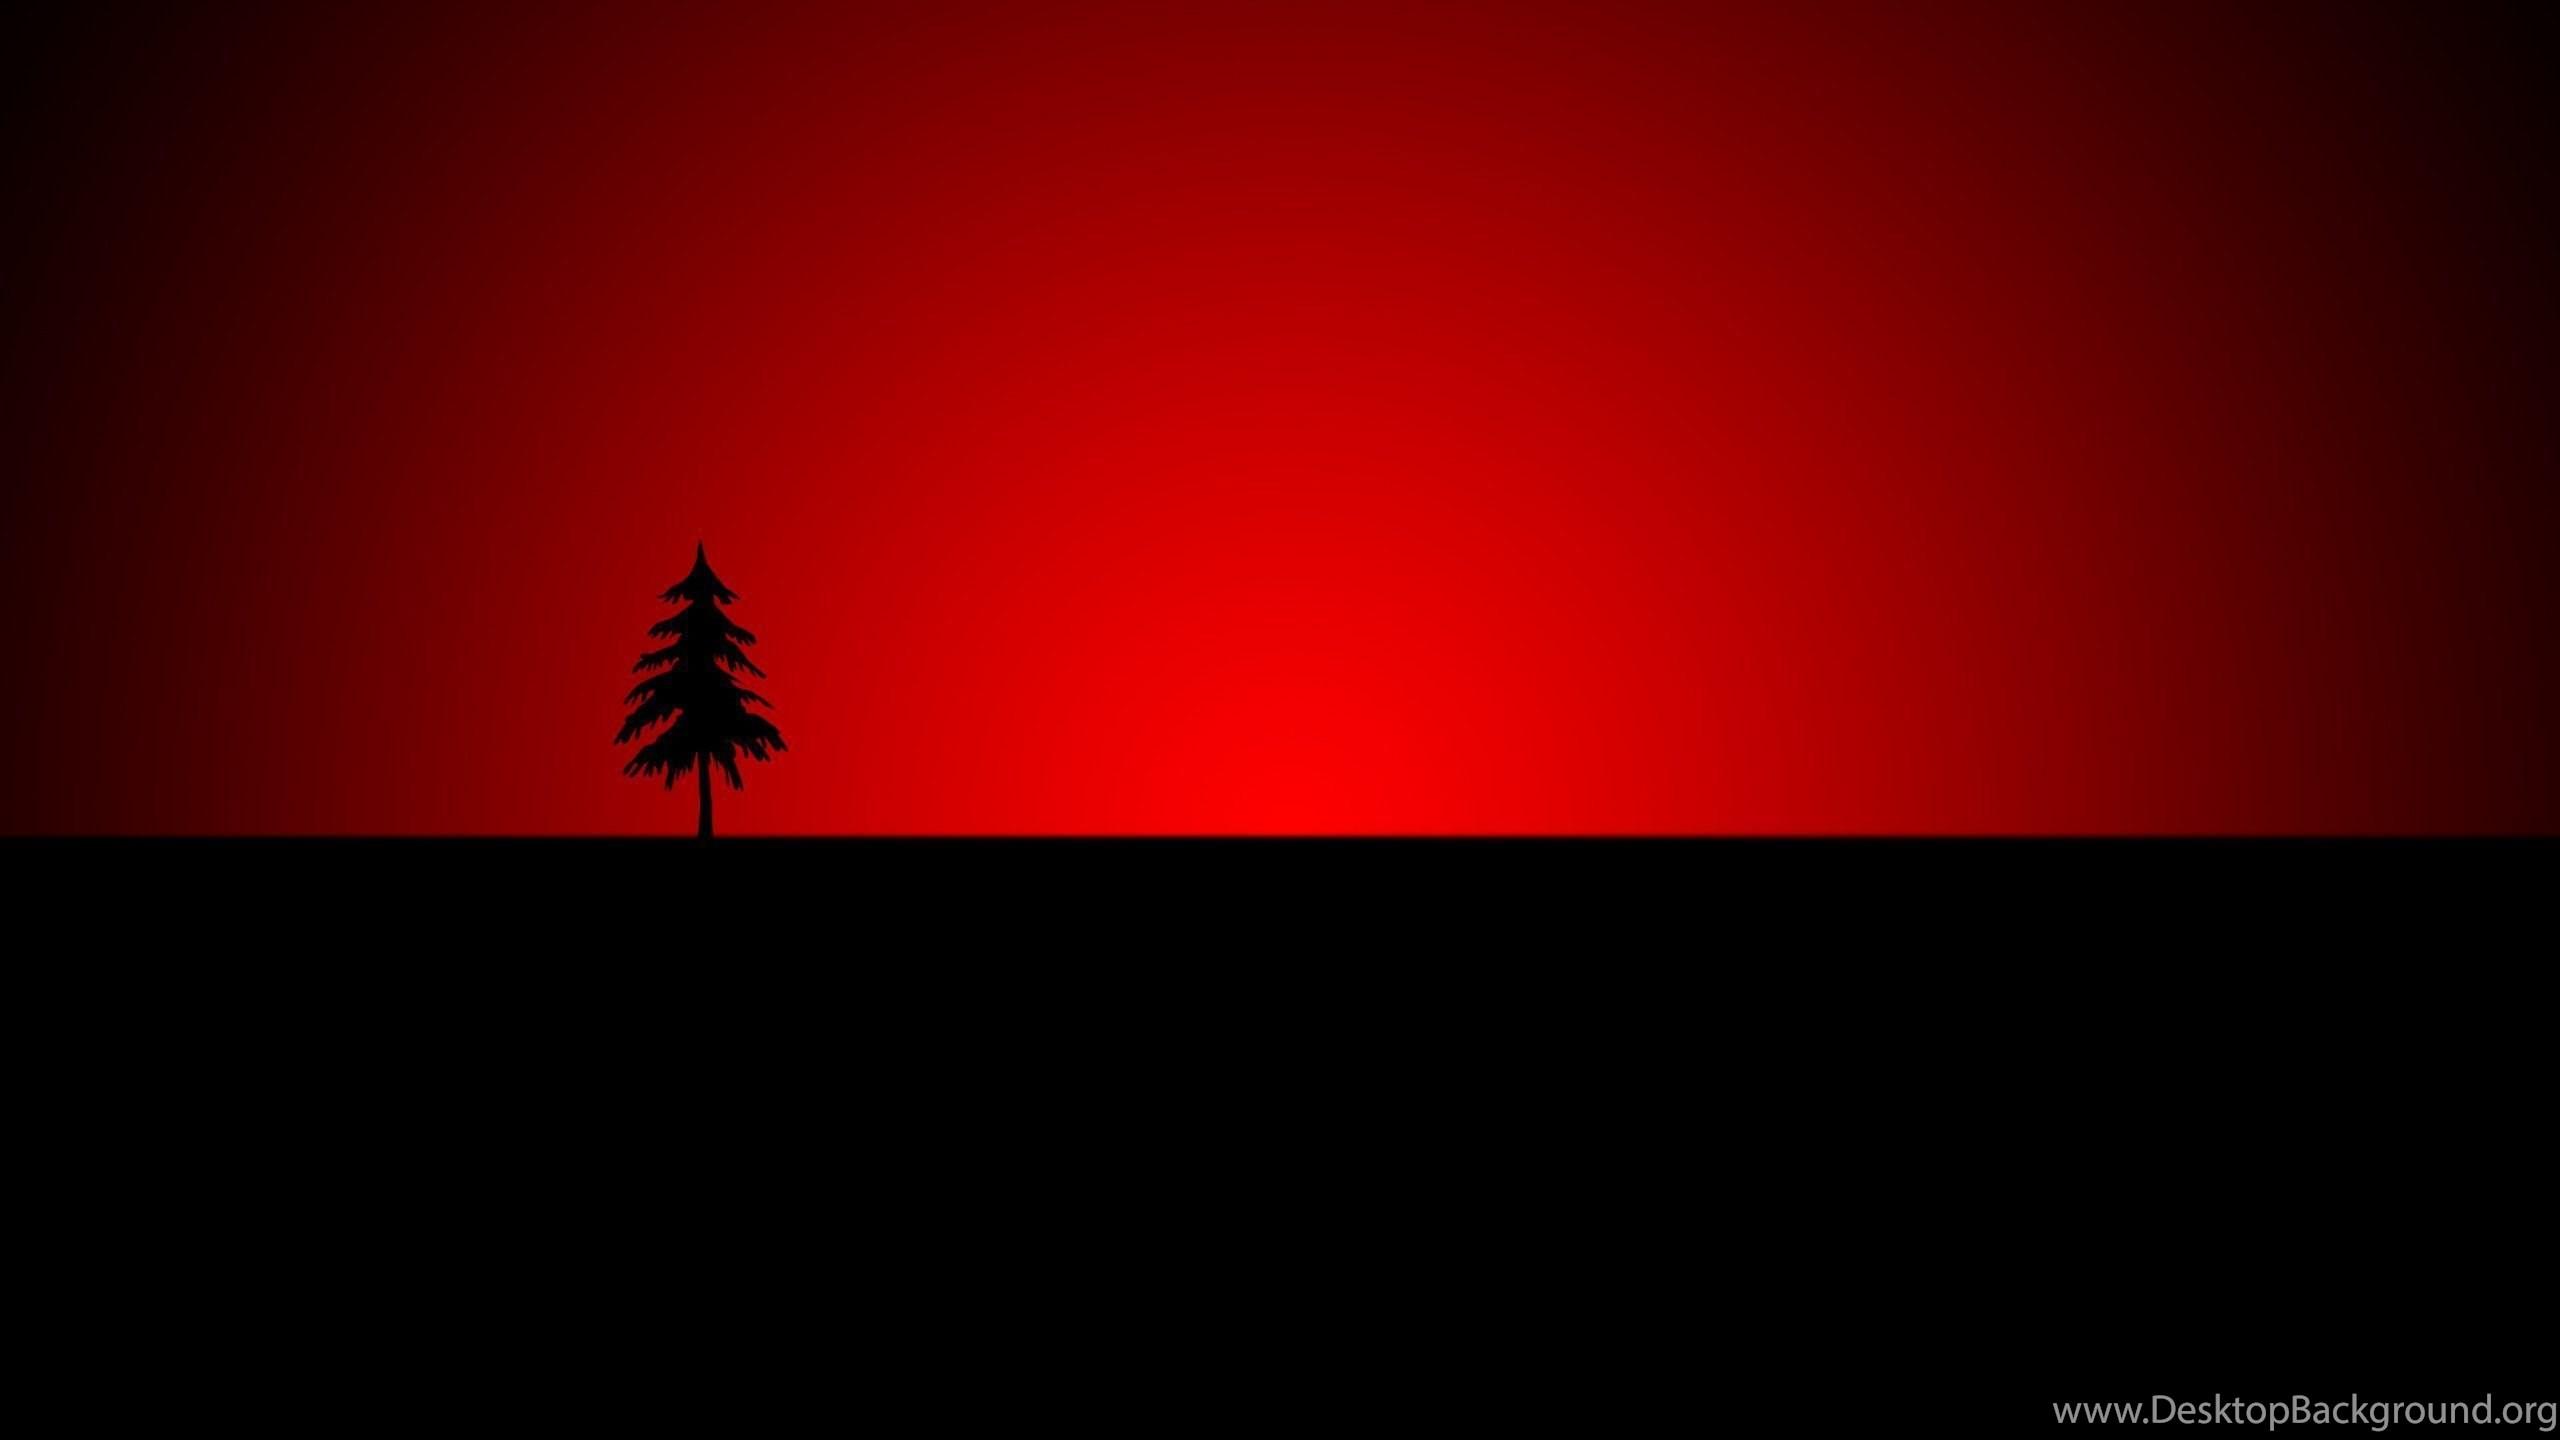 51908 black red wallpaper hd wiq009